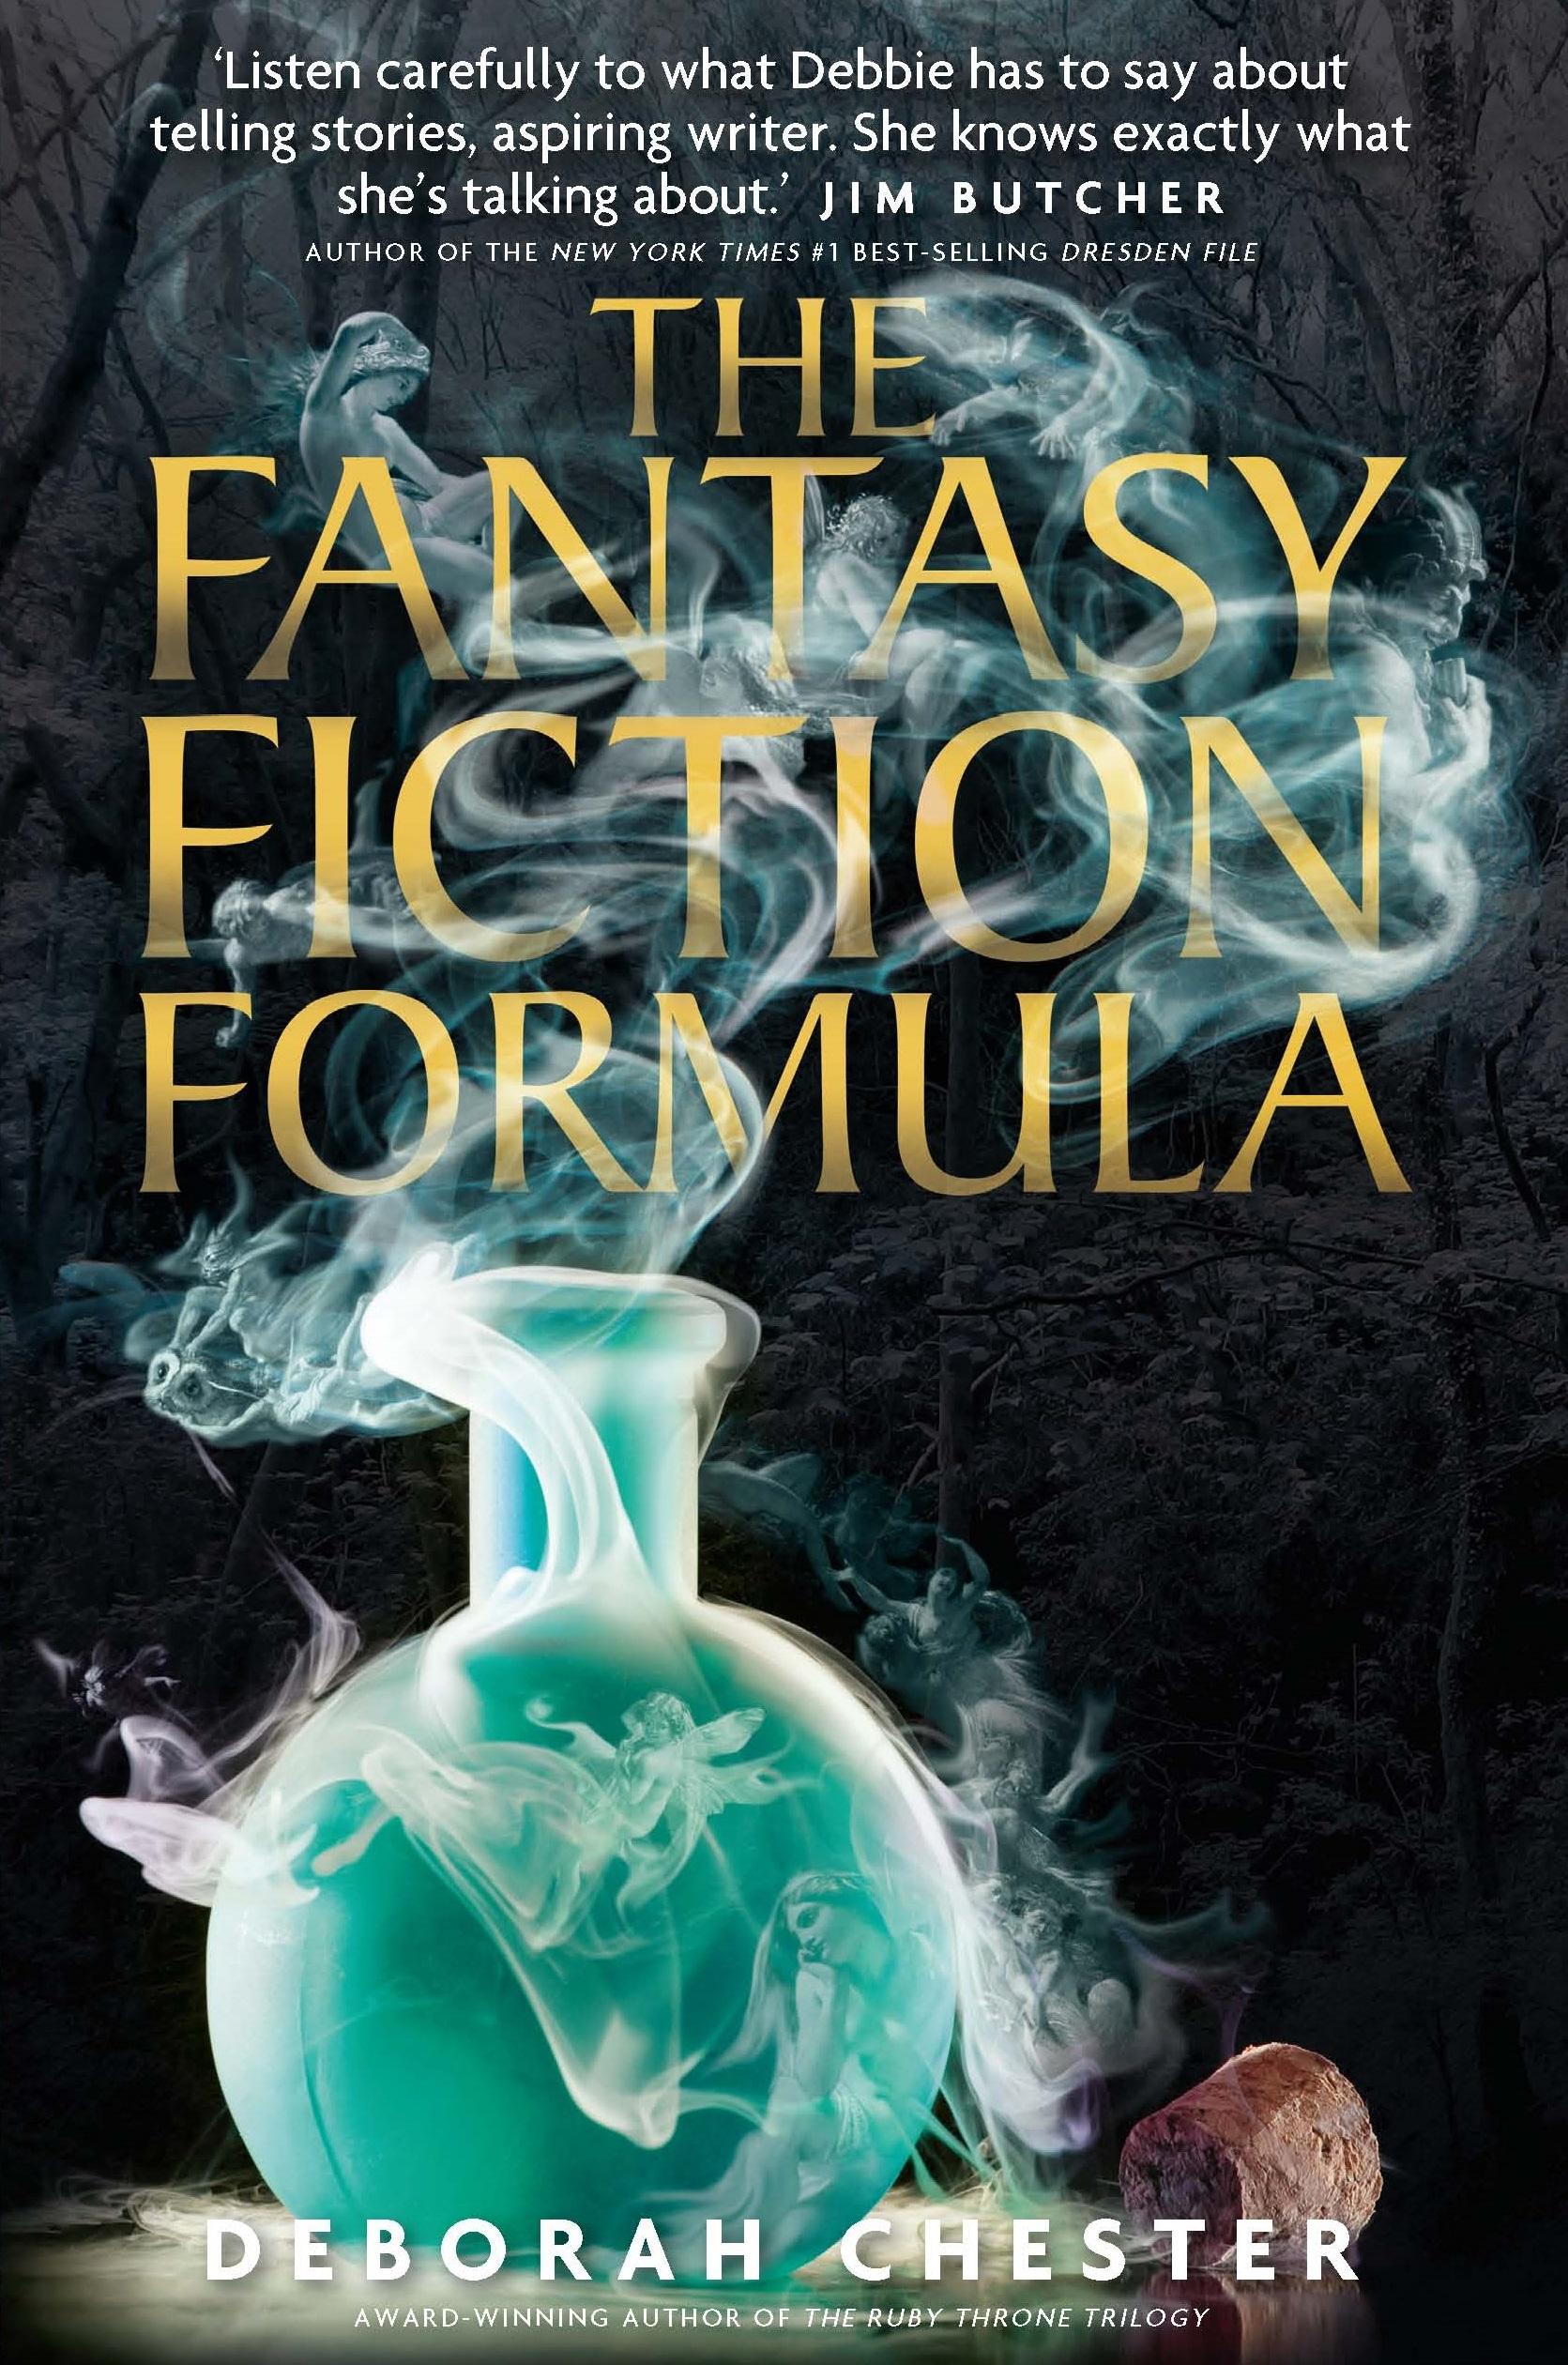 The fantasy fiction formula podcast - Manchester University Press